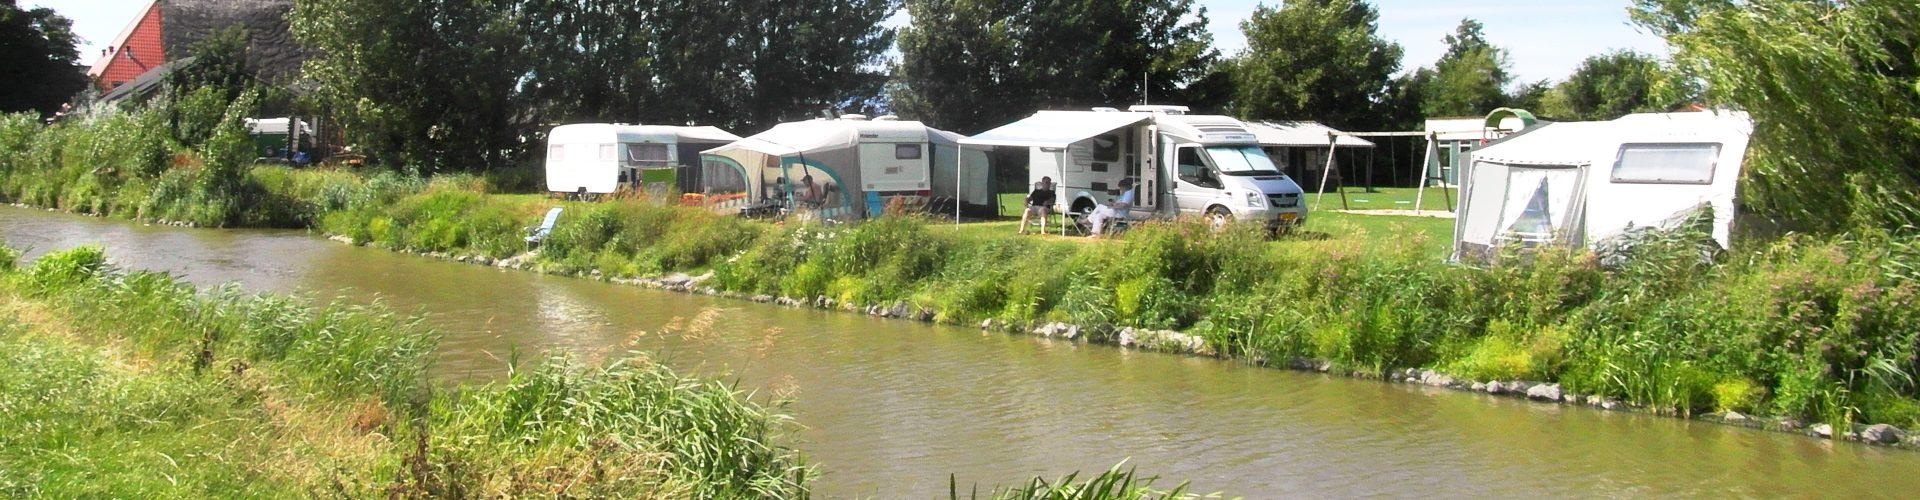 Camping aan het water, friesland